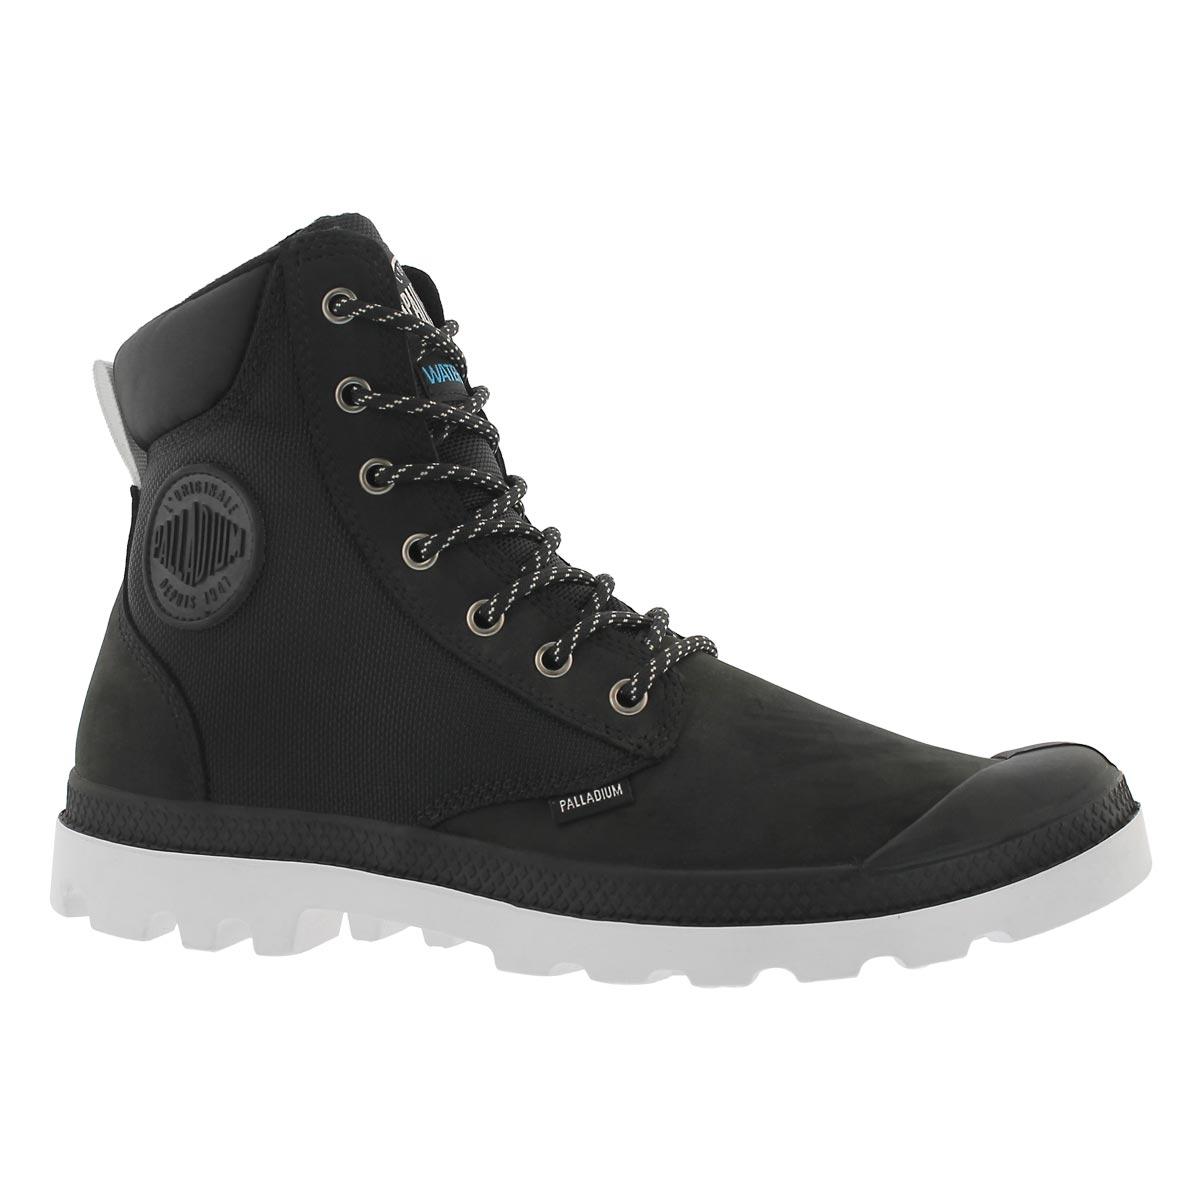 Men's PAMPA SPORT CUFF blk/wht waterproof boots